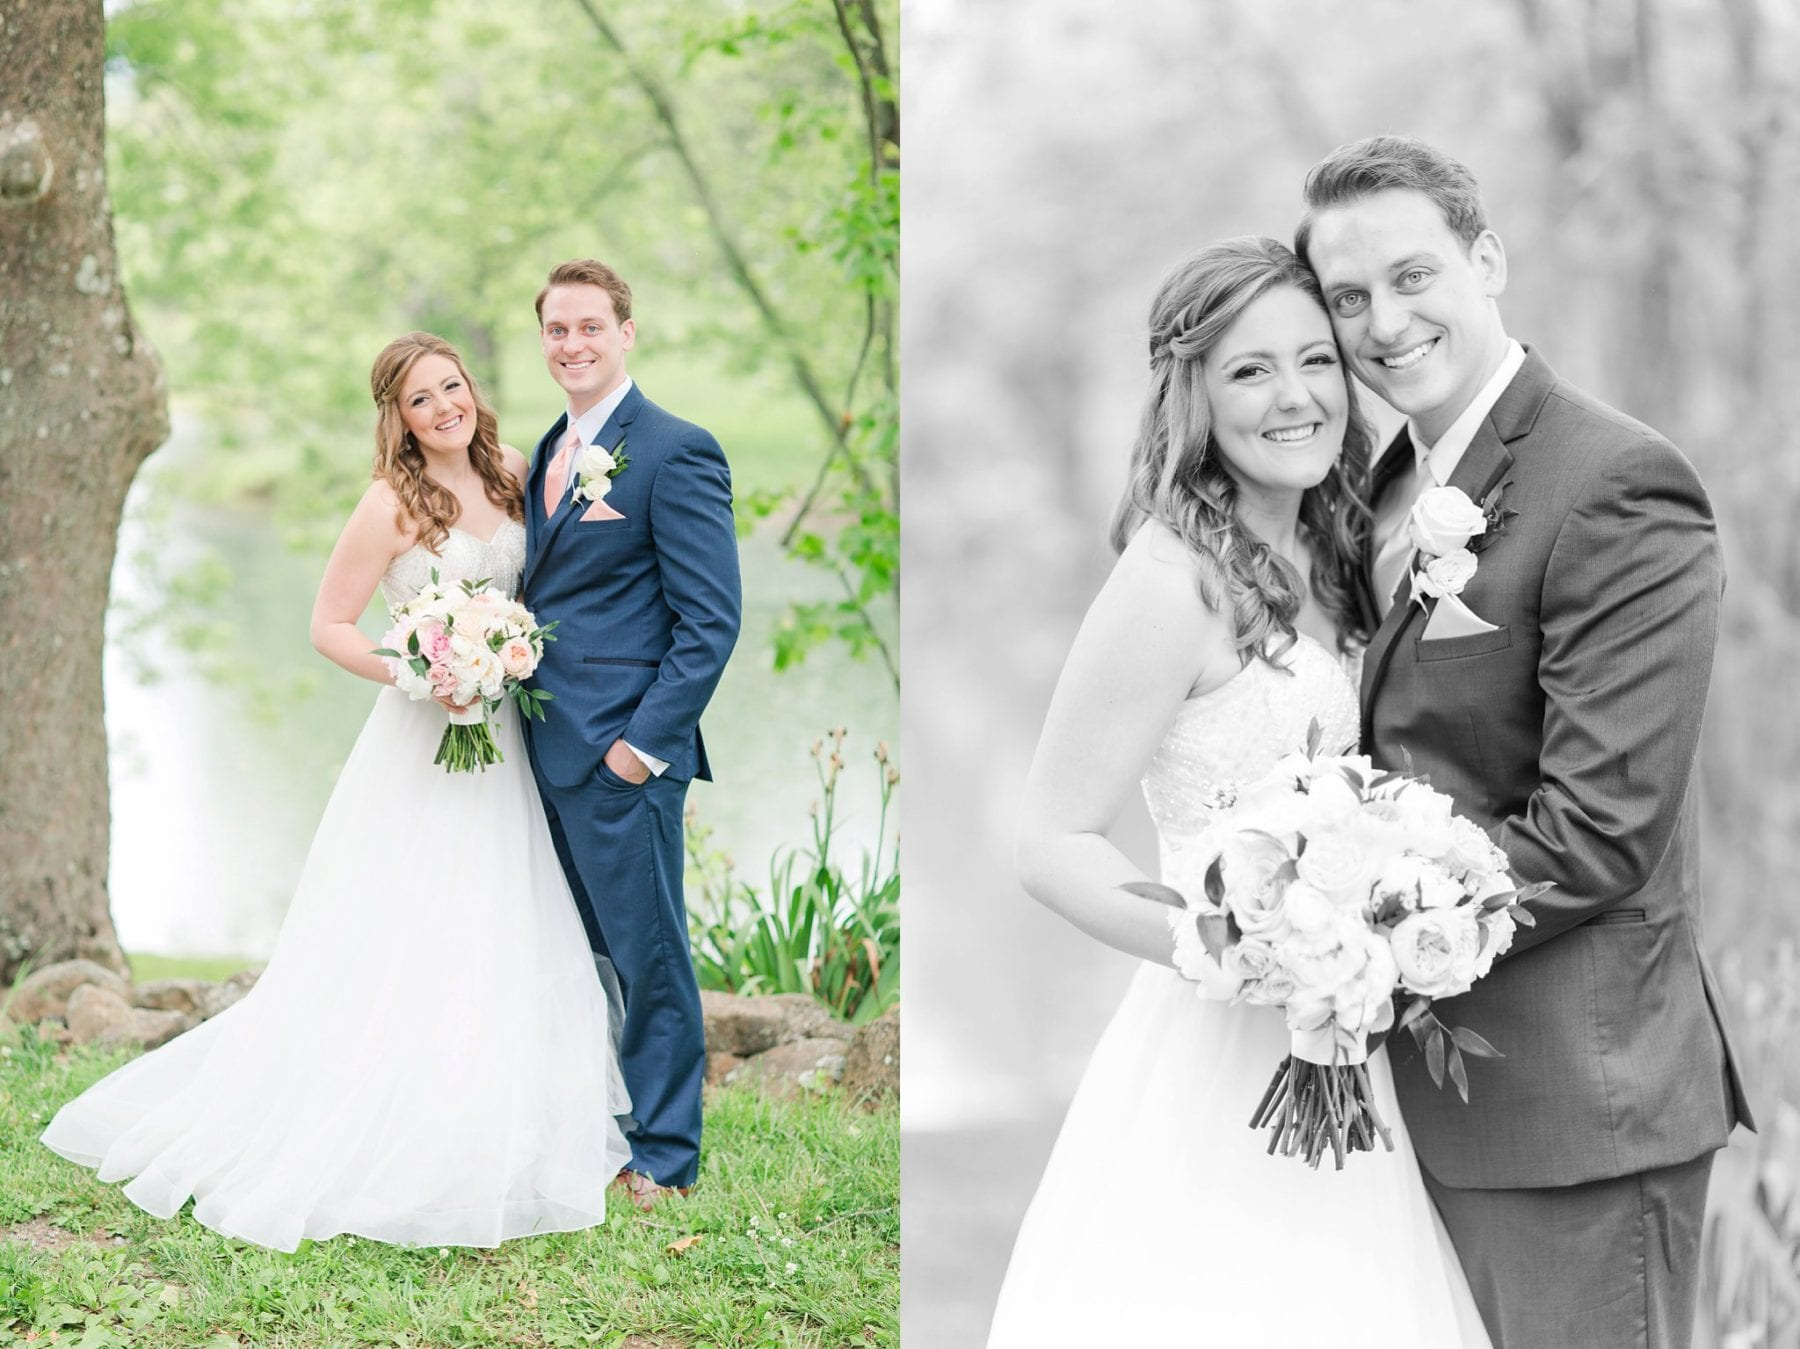 Justin & Megan Big Spring Farm Wedding Photos-97.jpg